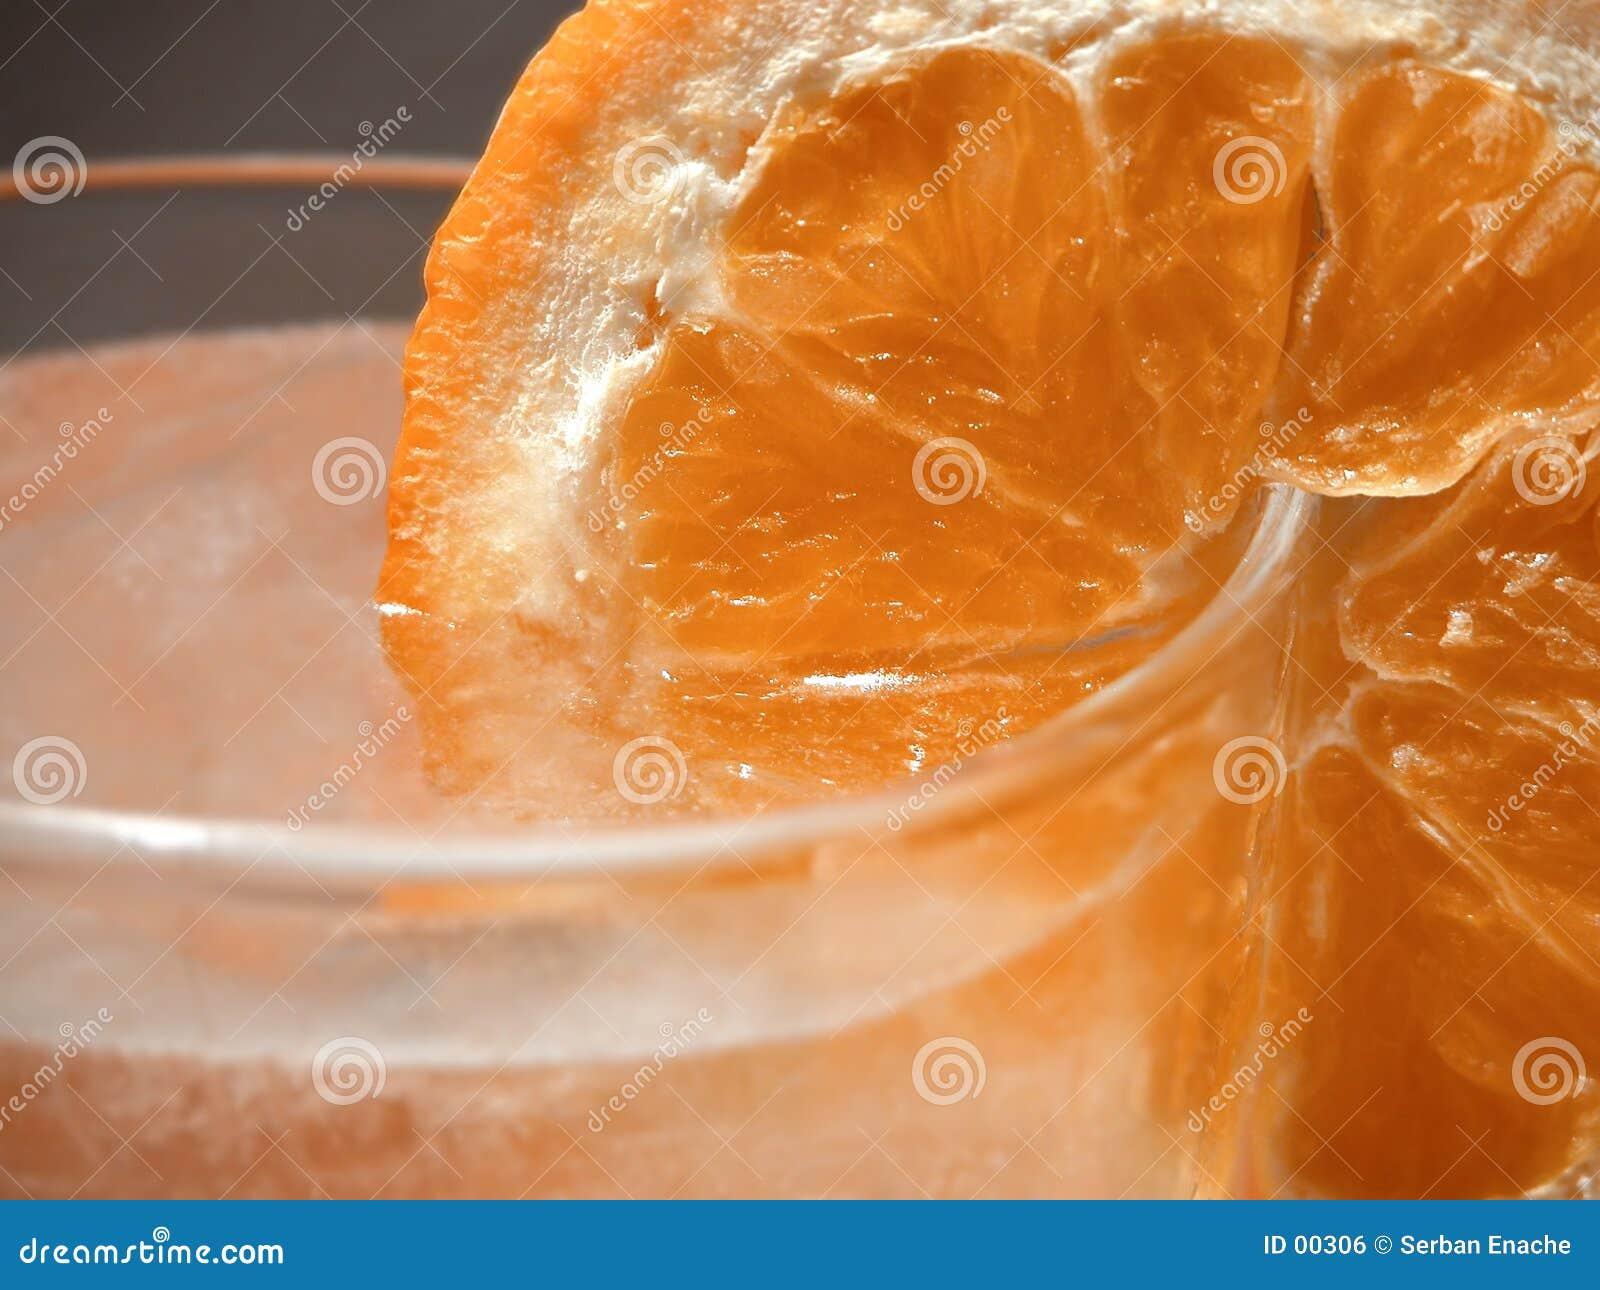 Part orange - groupe